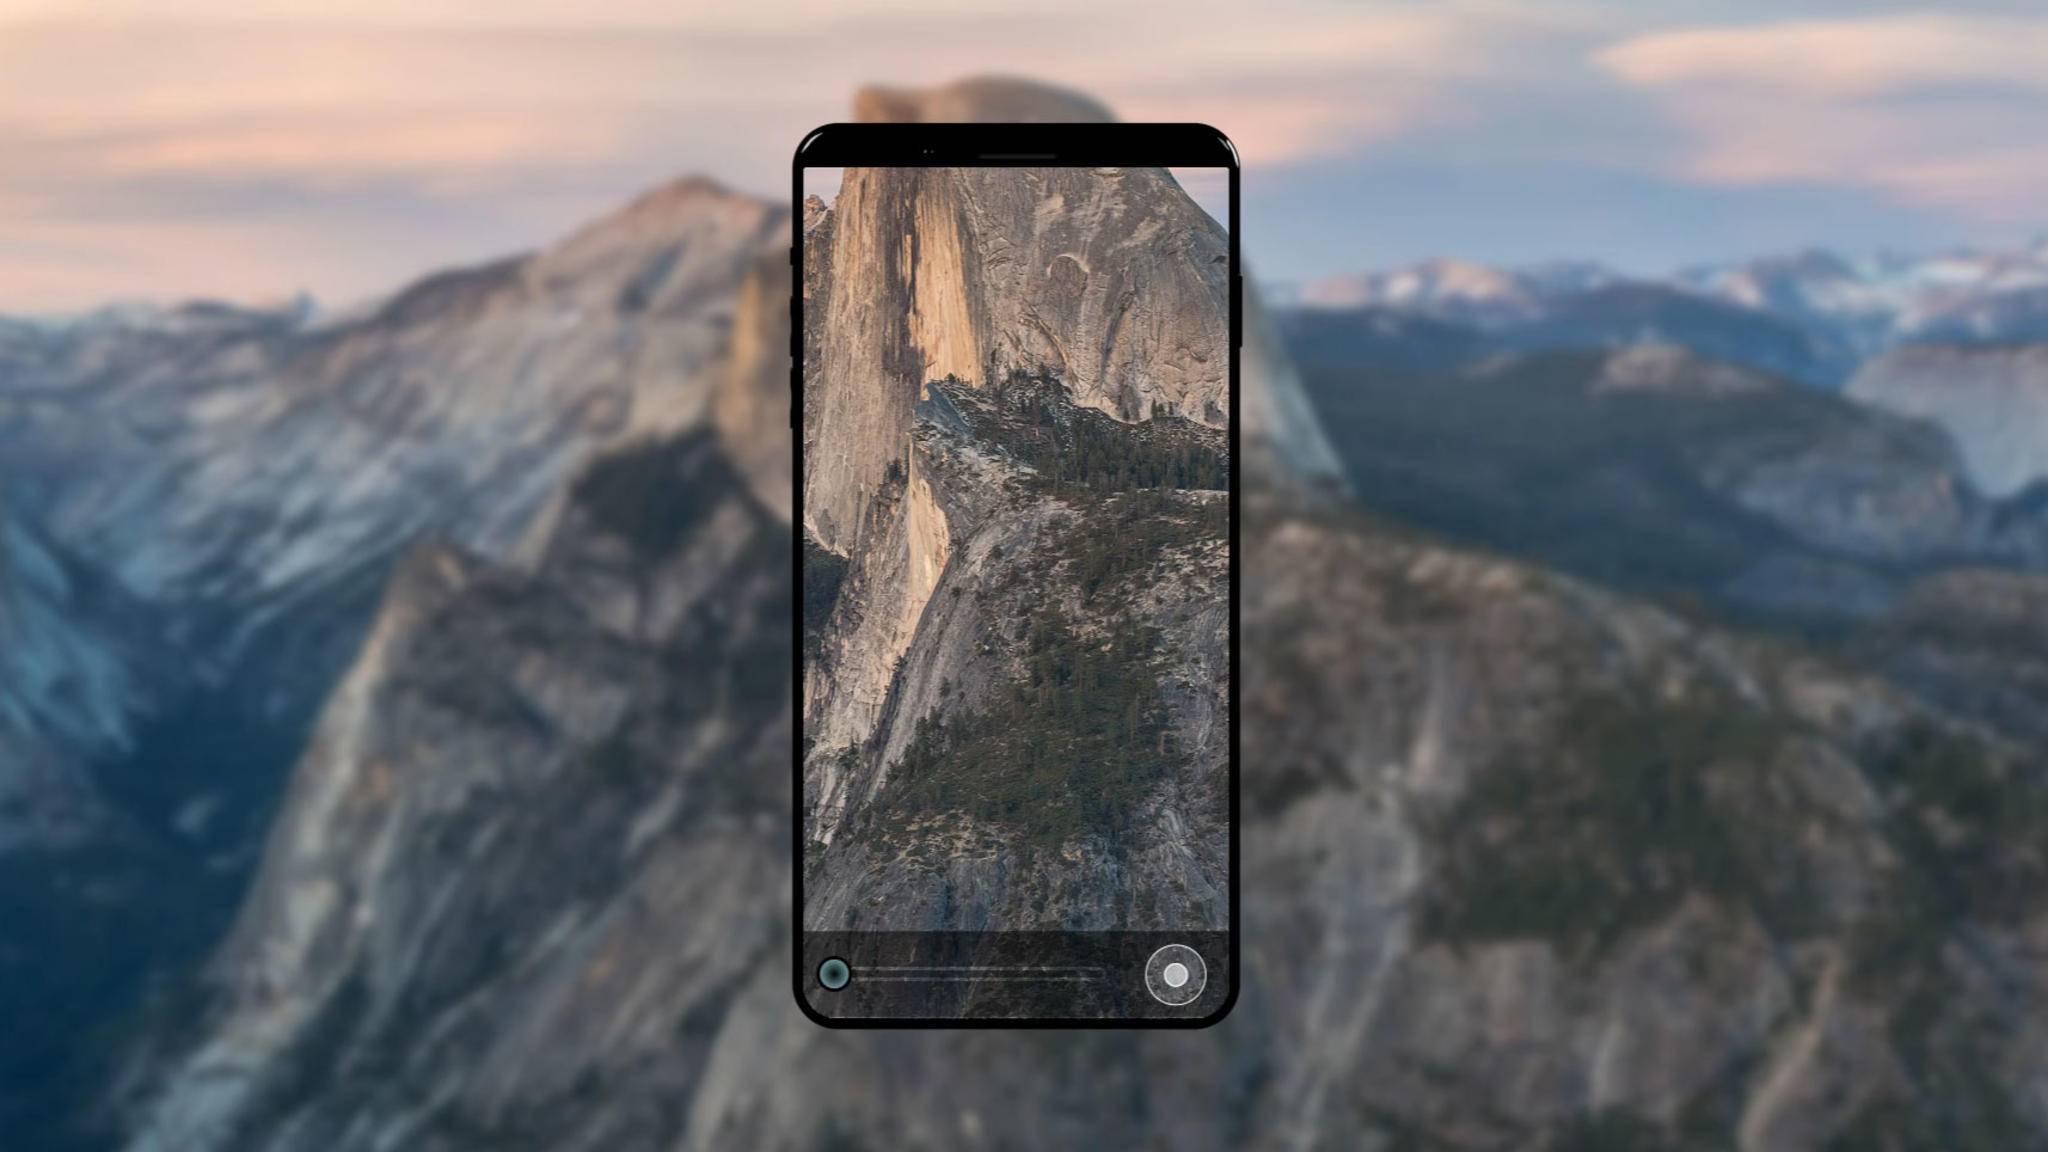 iphone 8 bekommt angeblich curved screen und usb c anschluss. Black Bedroom Furniture Sets. Home Design Ideas